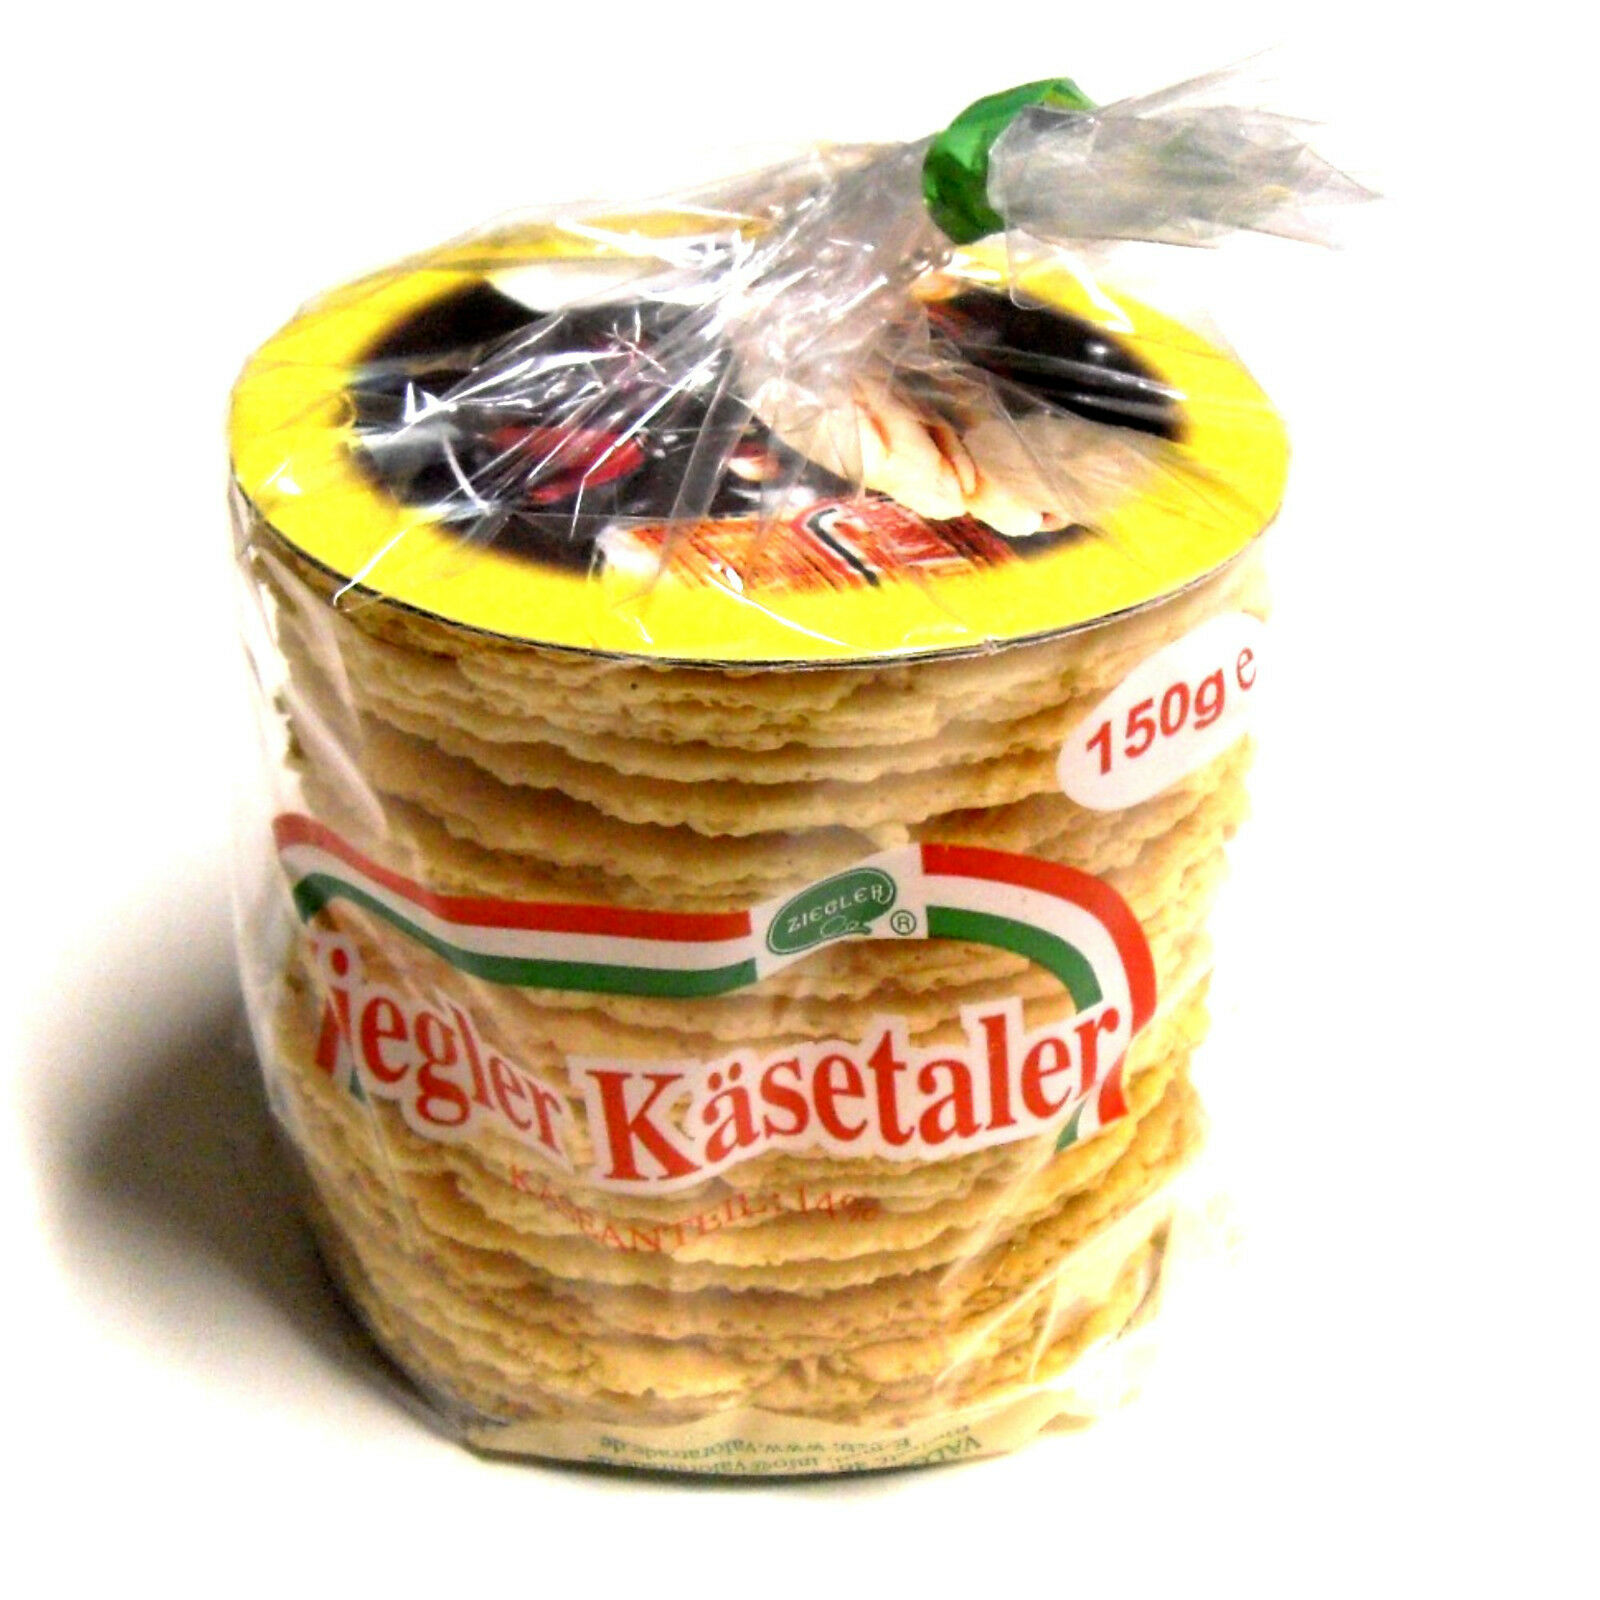 Ziegler Käsetaler natur 4x150g Käsegebäck Knabberei Waffeln